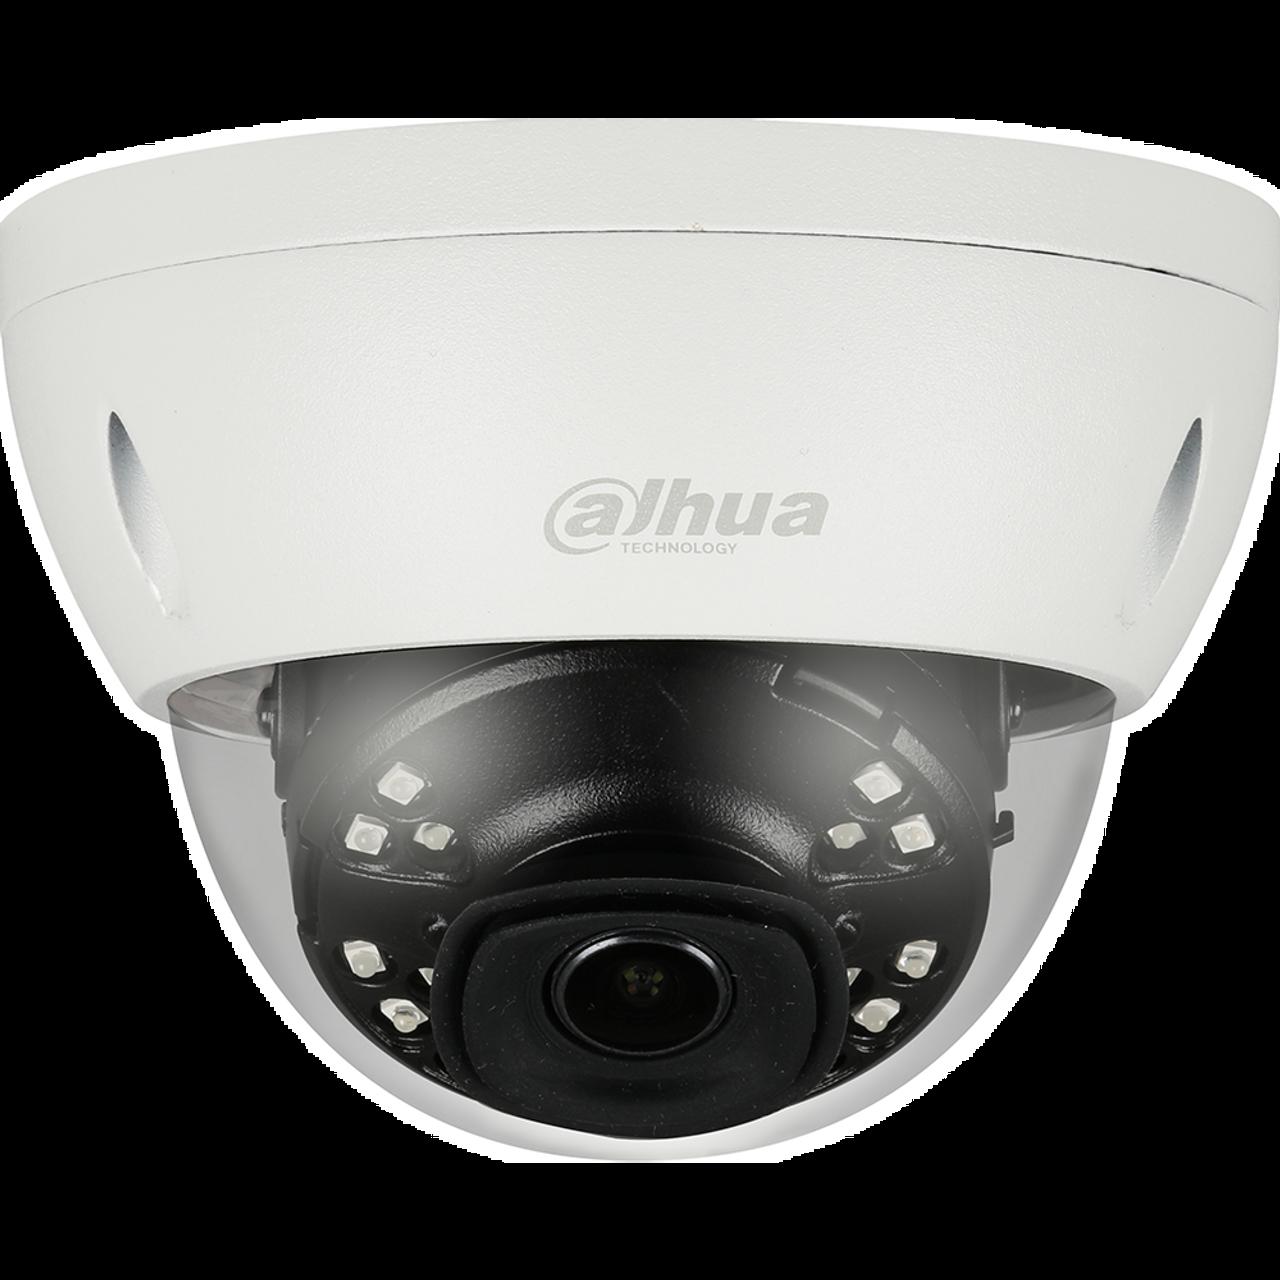 Dahua N84CL52 4K / 8MP 2.8mm ePoE Mini Dome Network Camera   Speco Camera Wiring Diagram      Network Camera Store